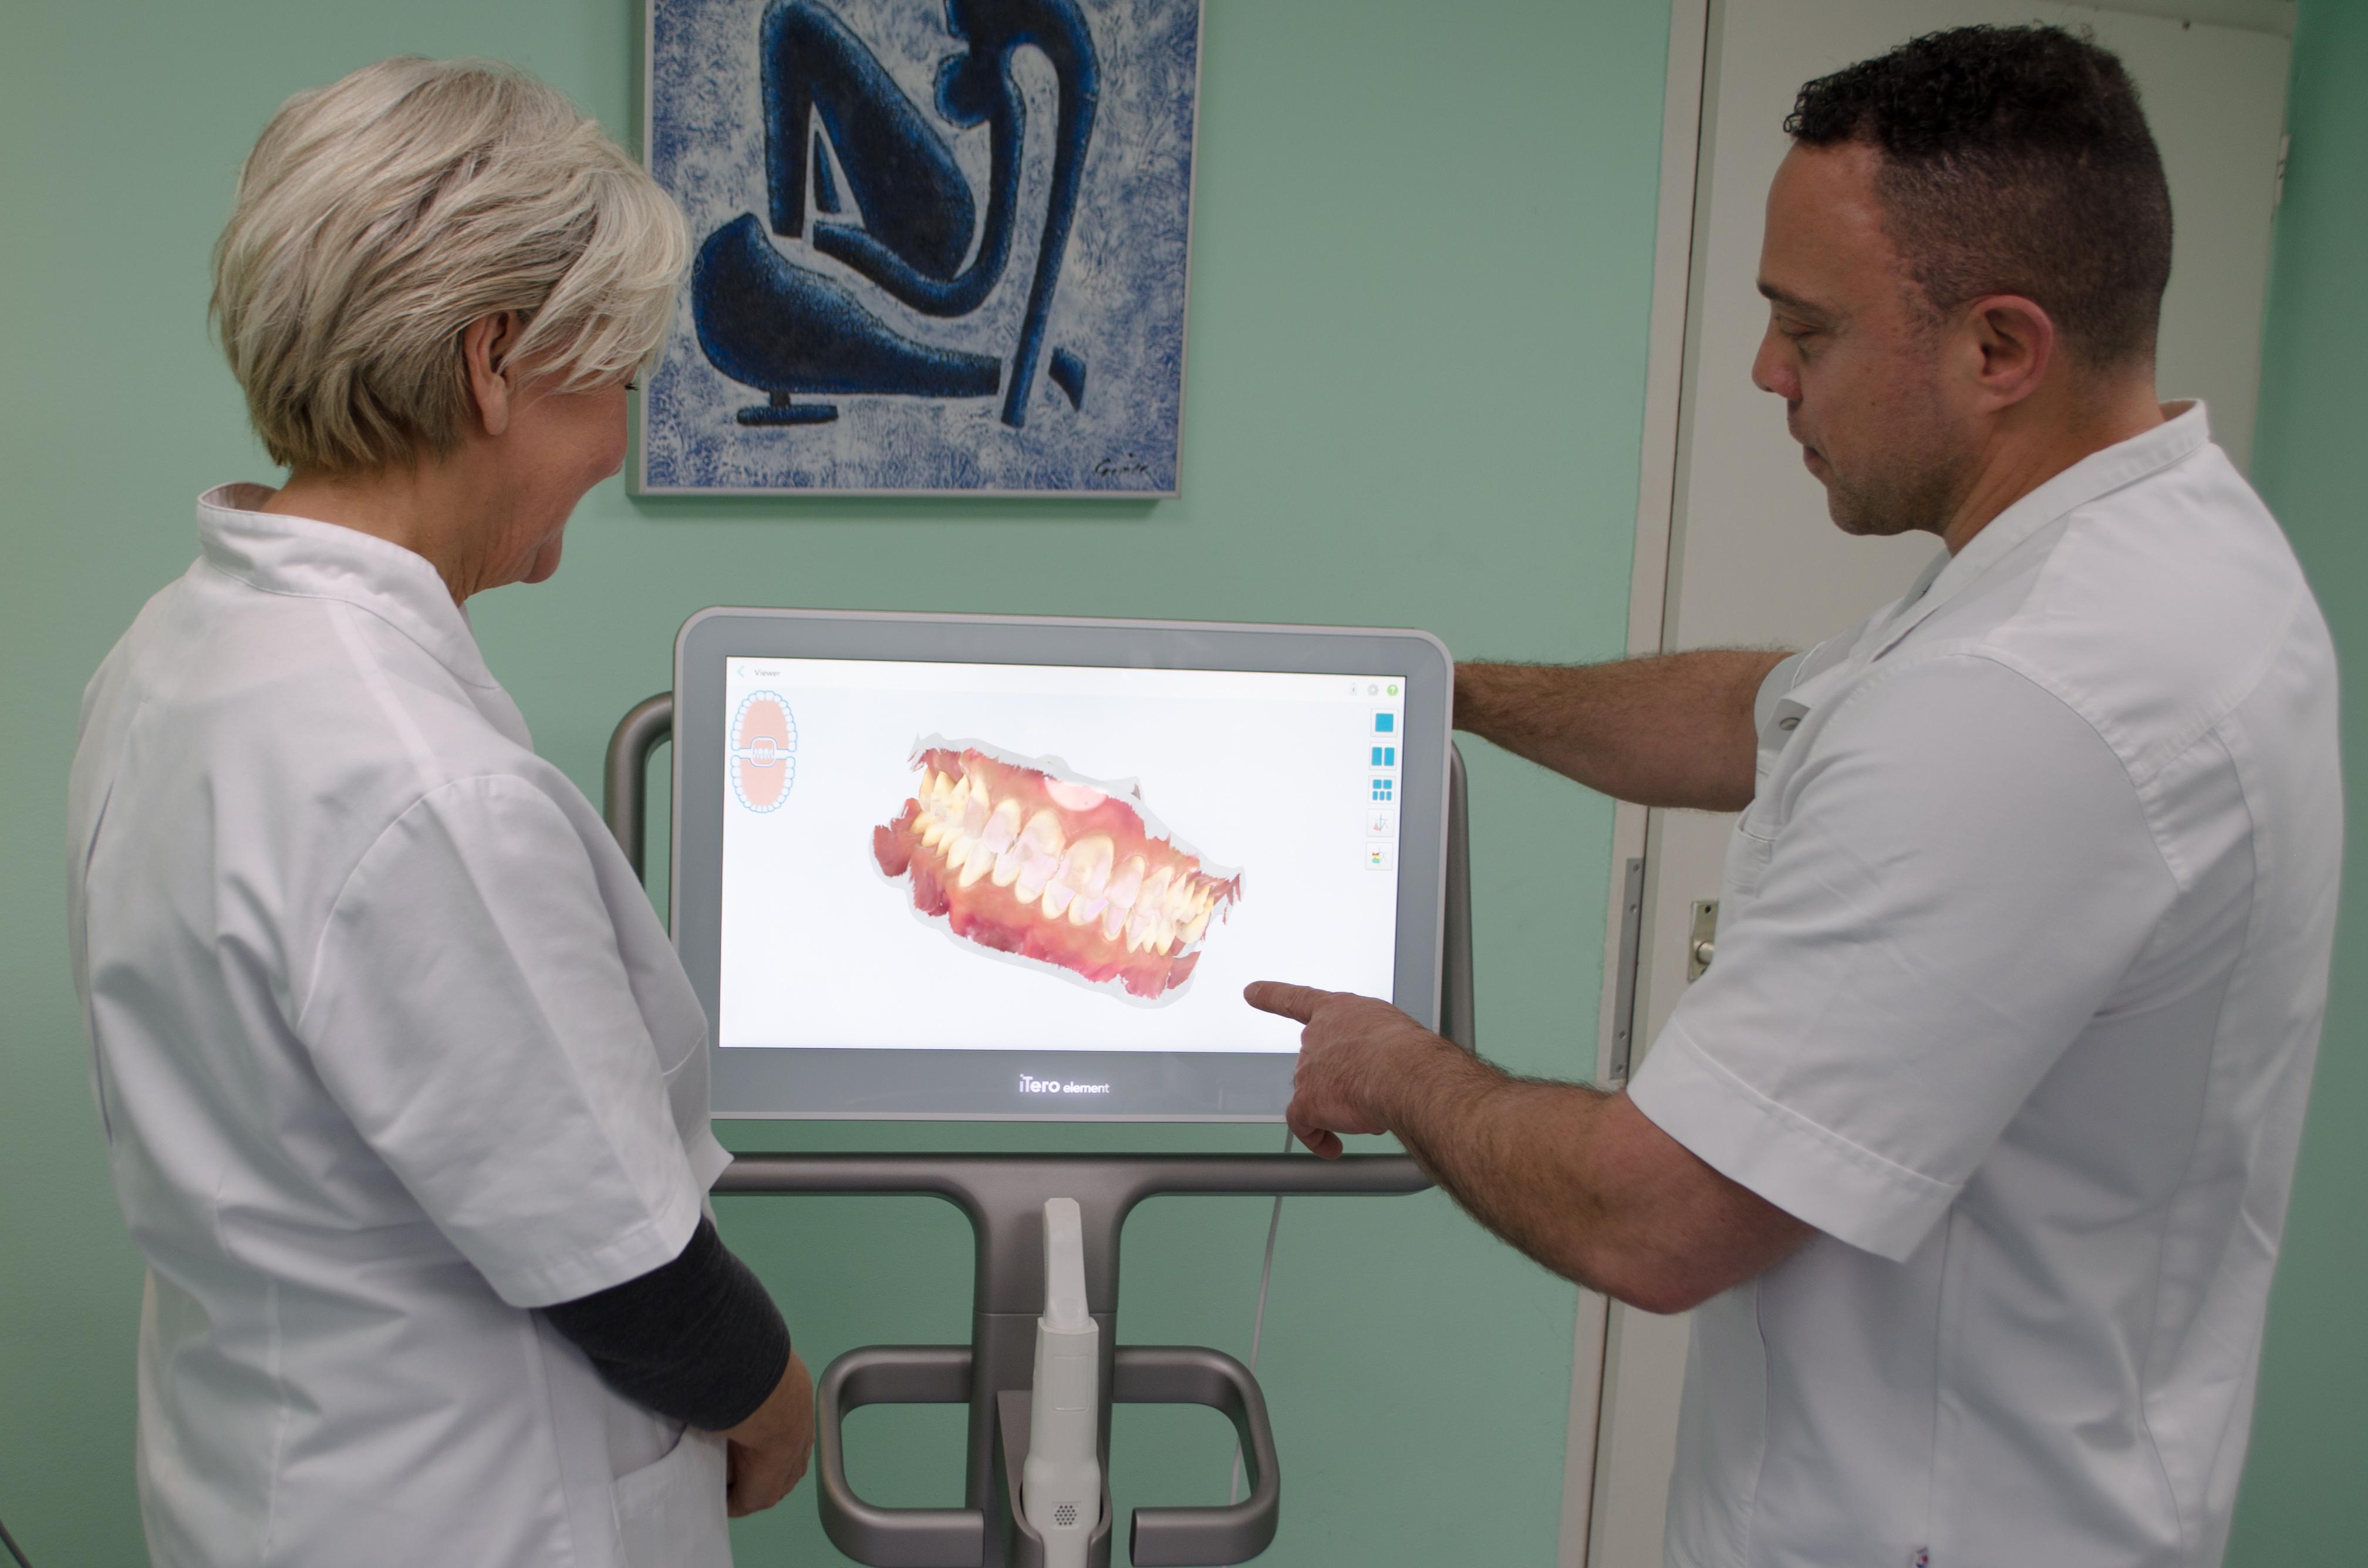 tandartsenpraktijk badhoevedorp